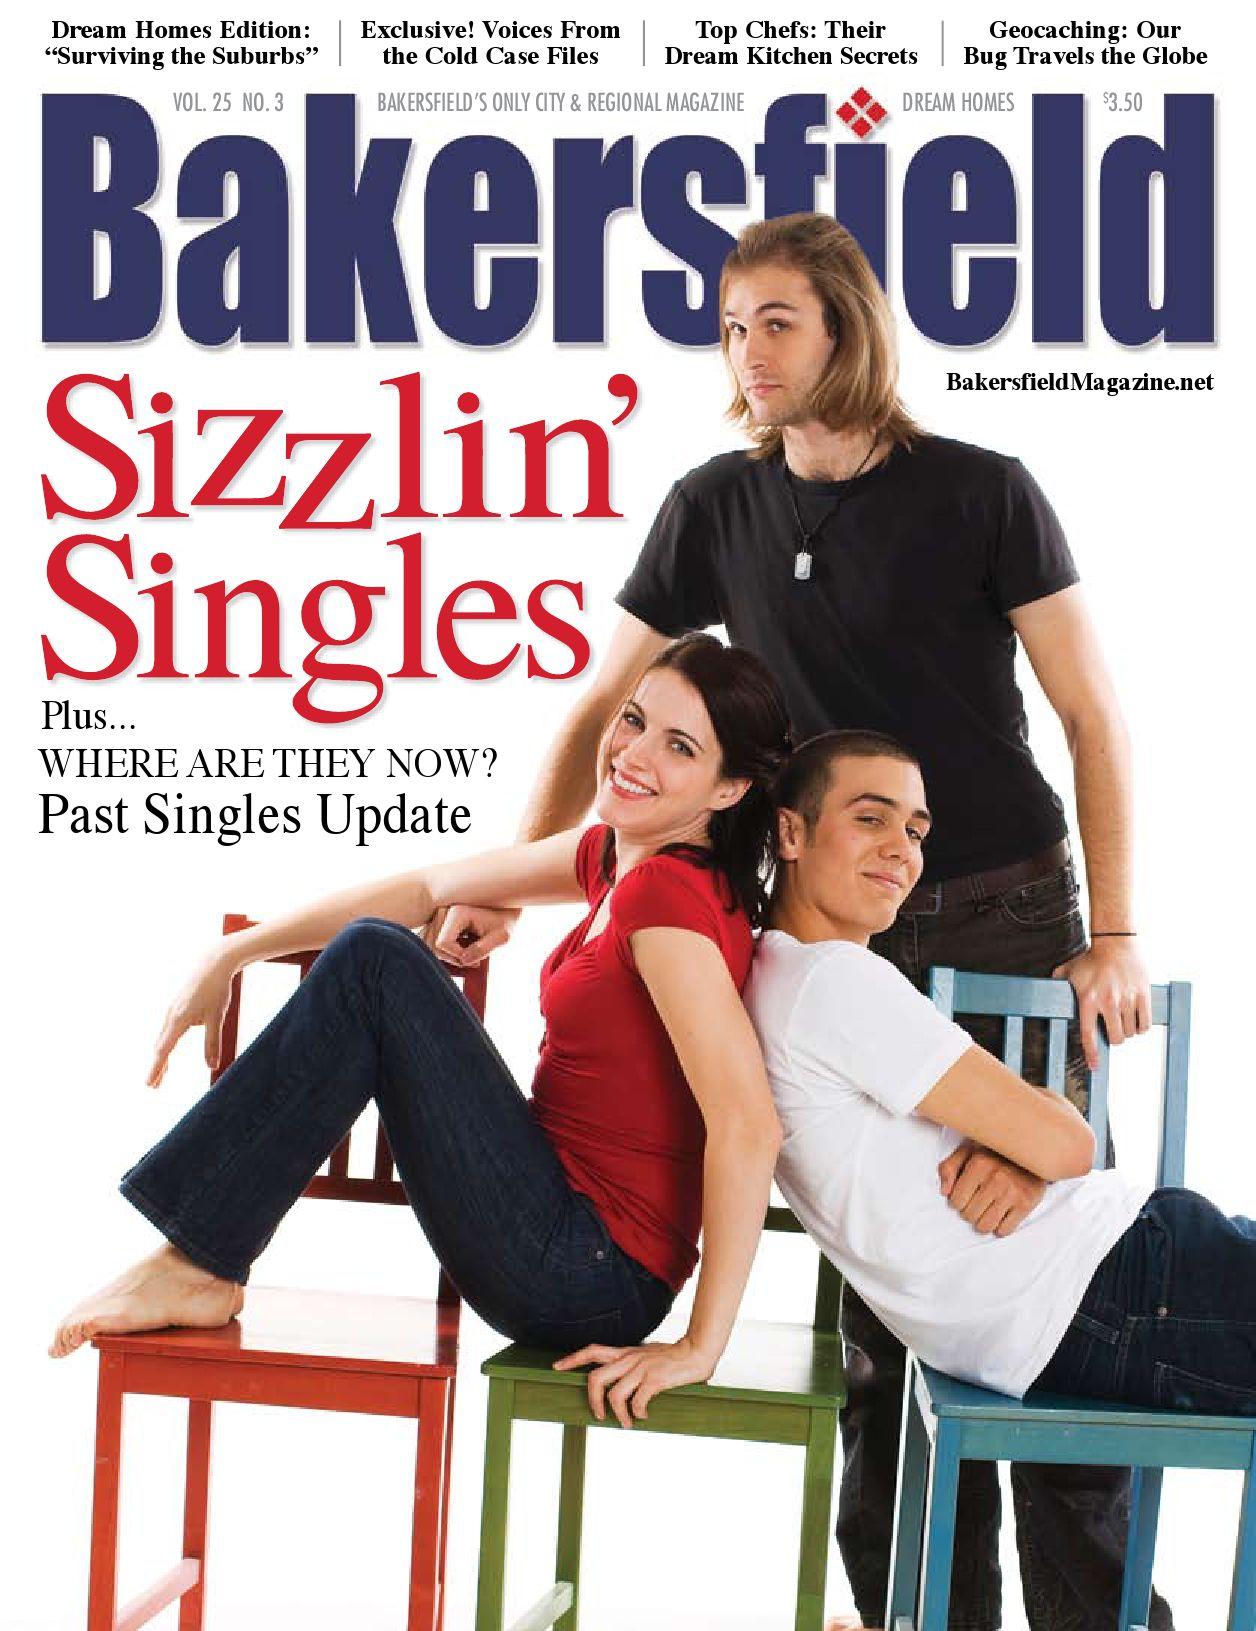 Bakersfield Magazine • 25-3 issue • Sizzlin Singles by Bakersfield ...